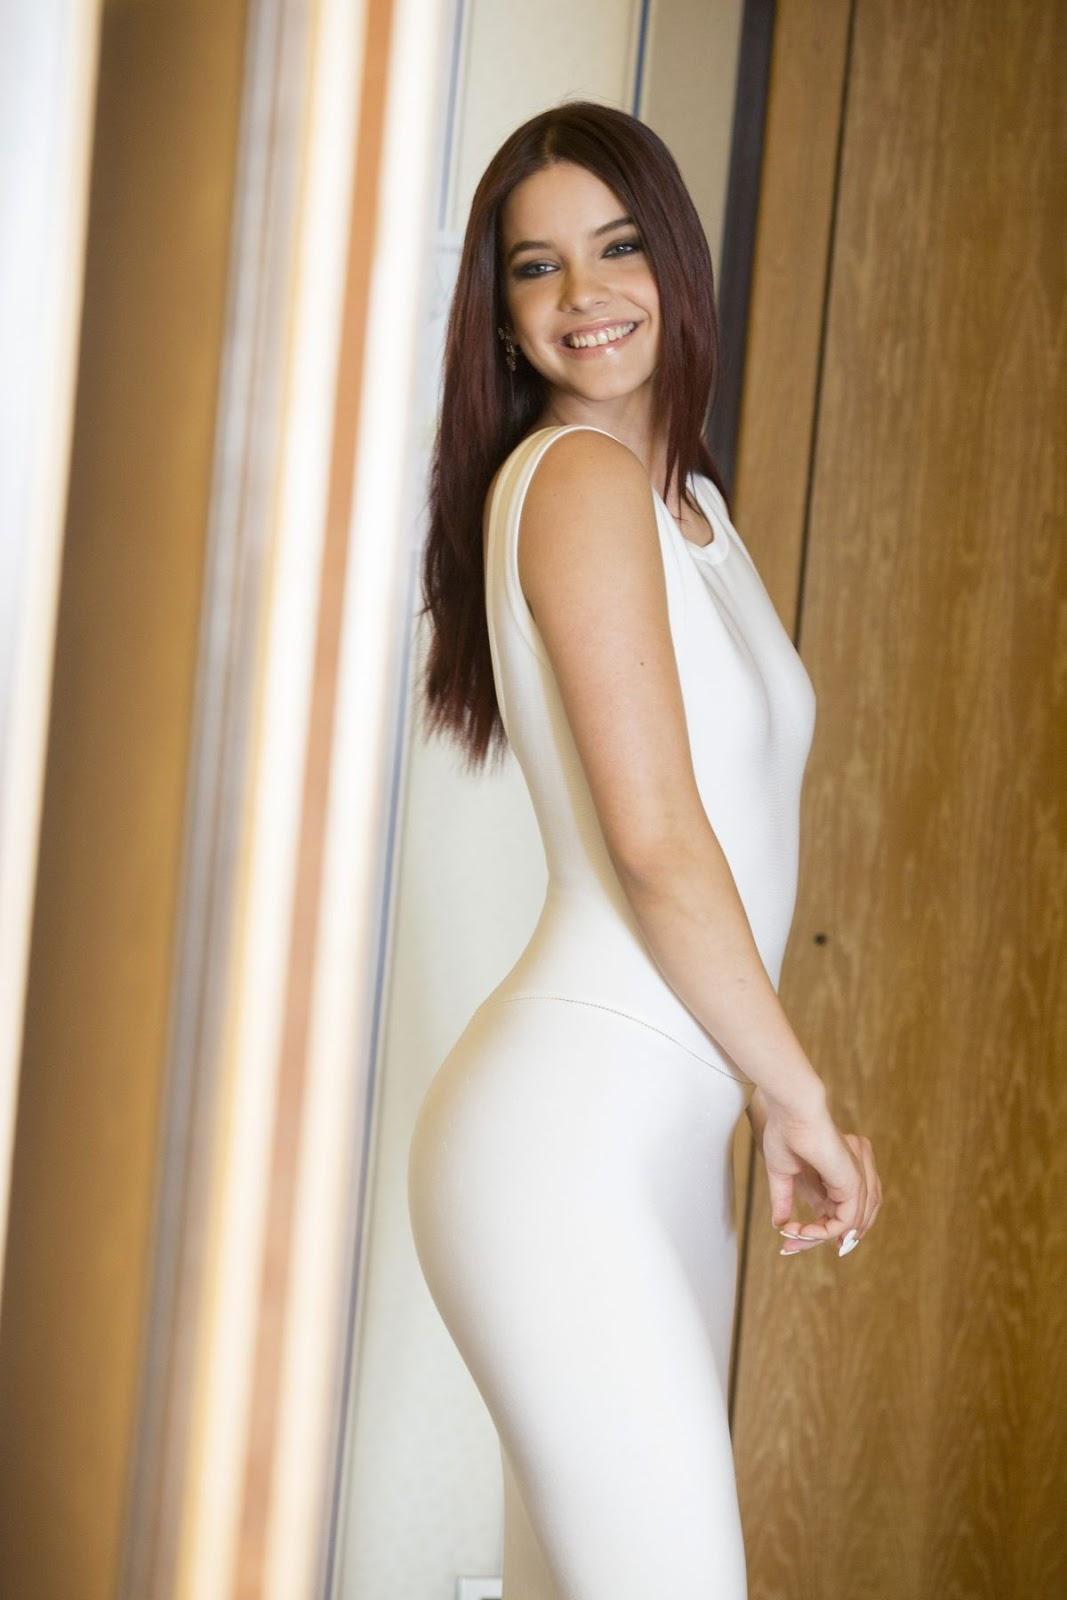 Barbara Palvin at L'oreal Paris Inside Cannes 2014 Photoshoot